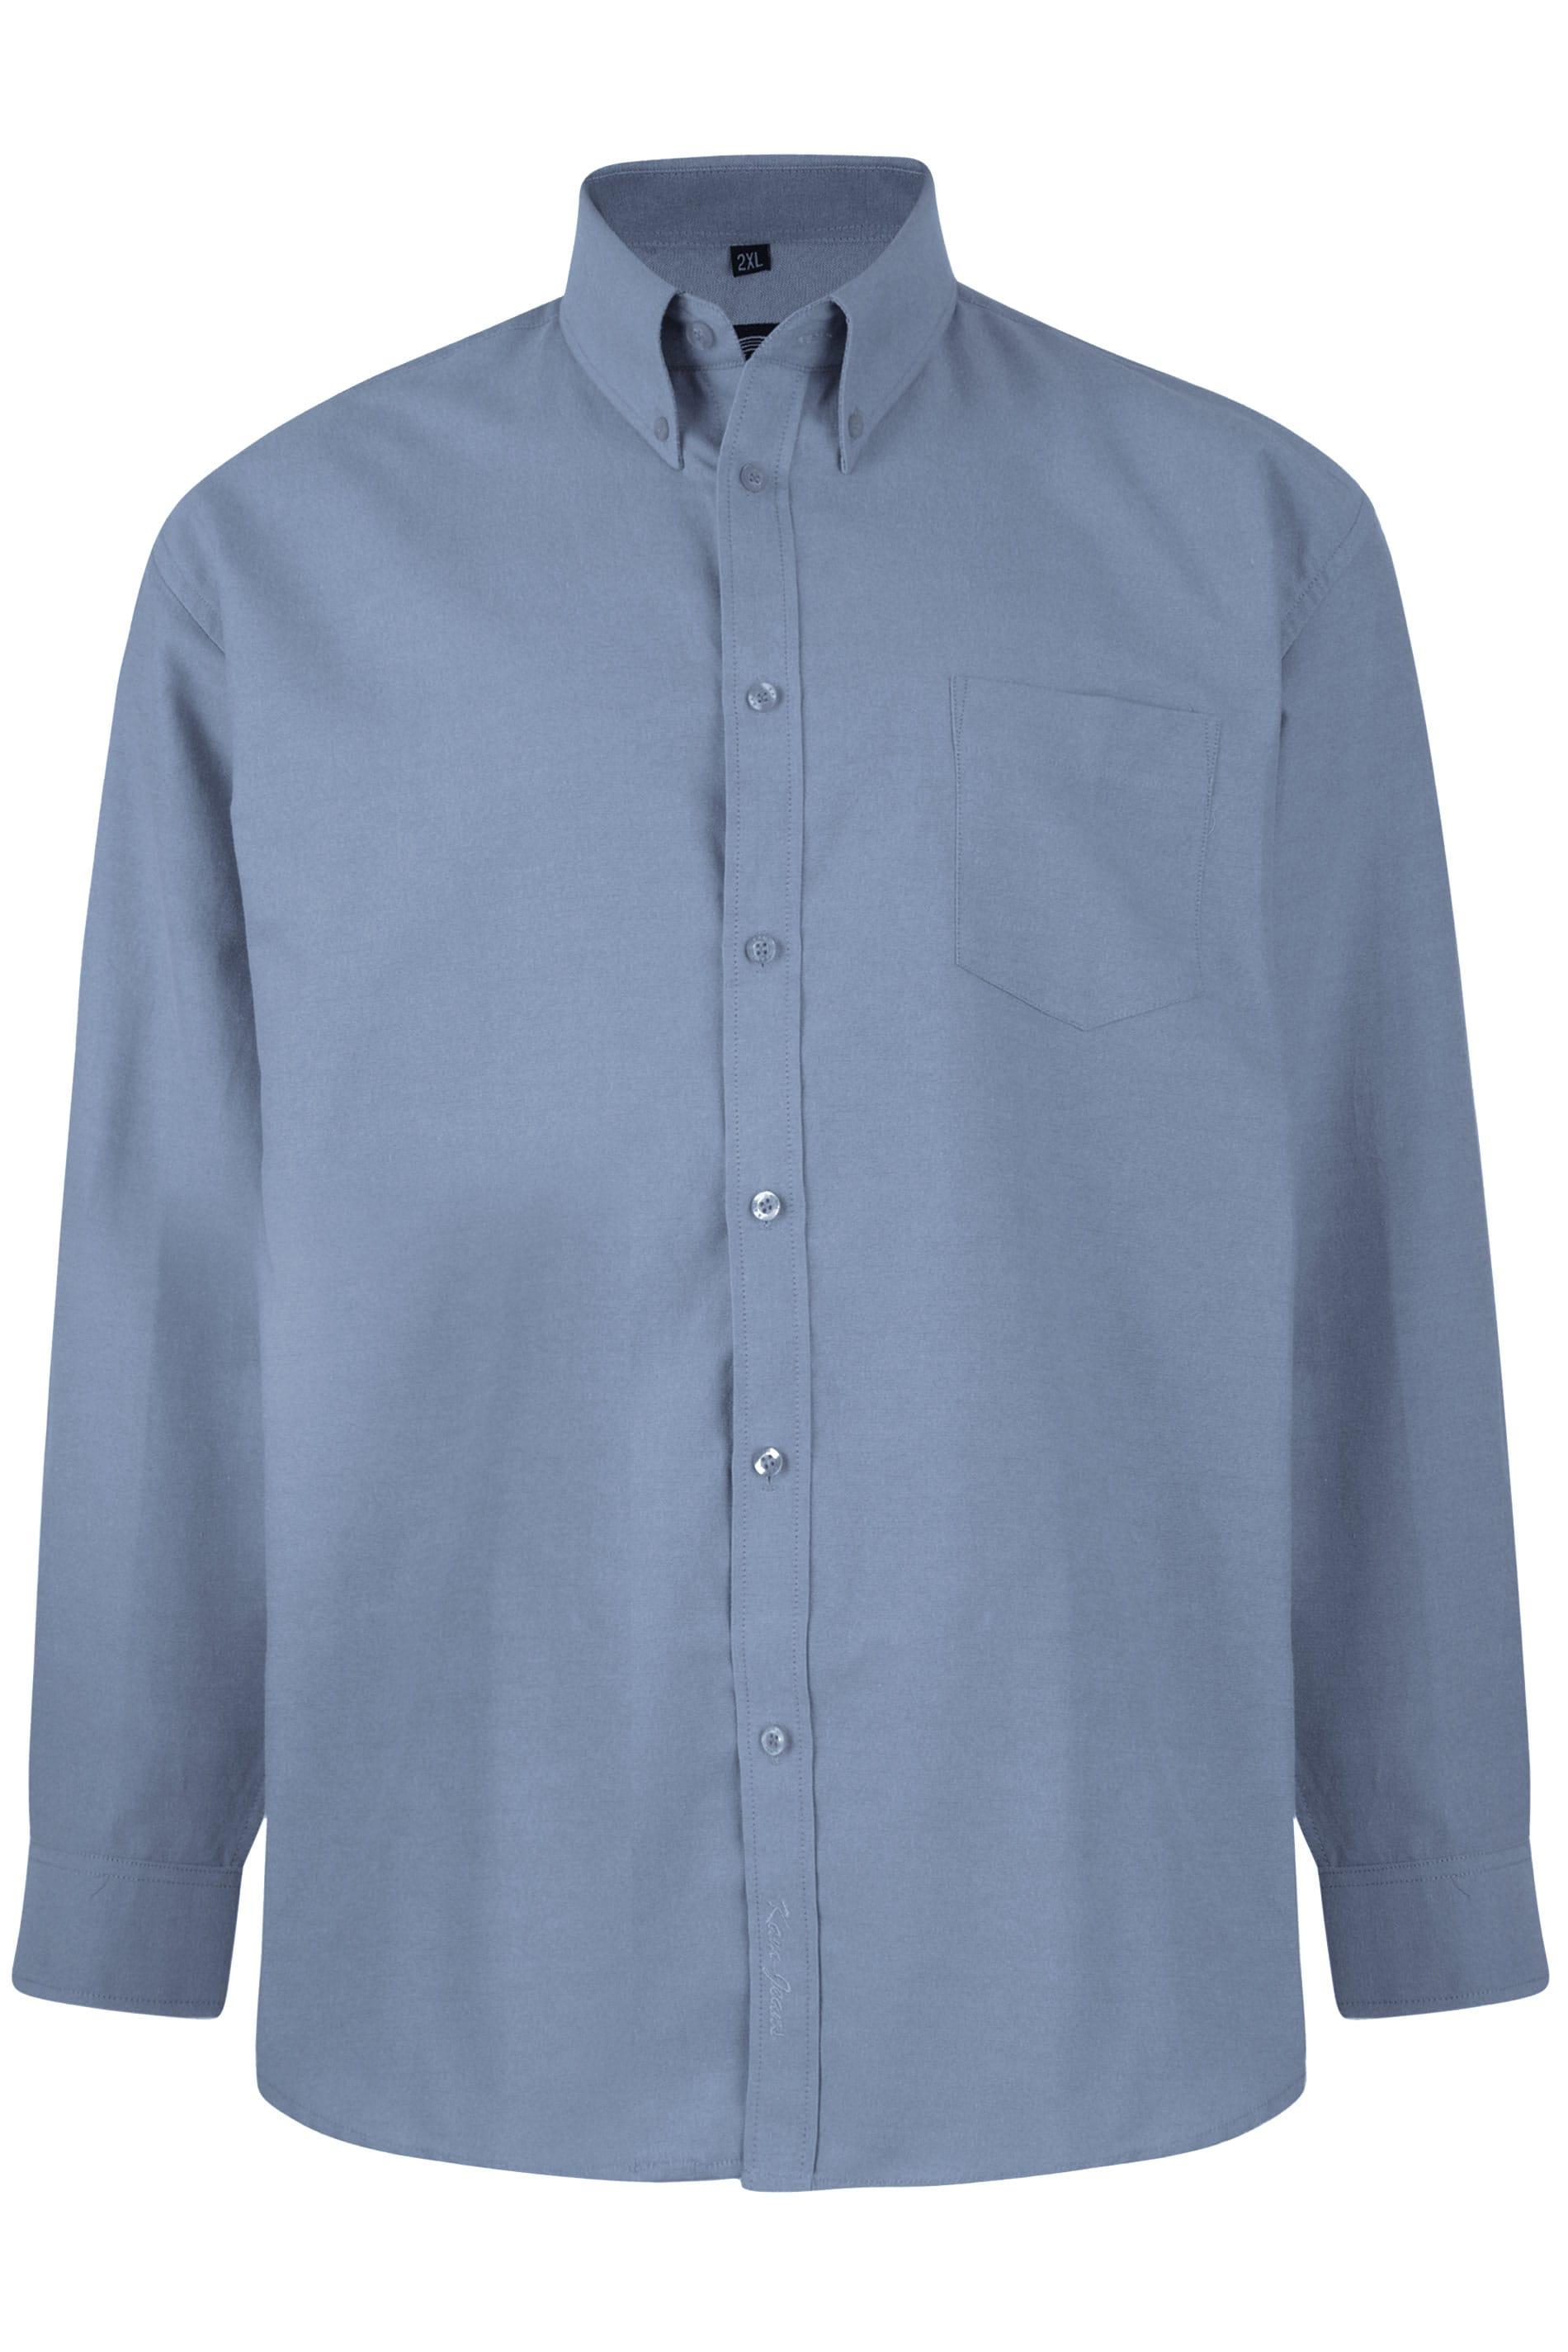 KAM Dark Blue Oxford Long Sleeve Shirt